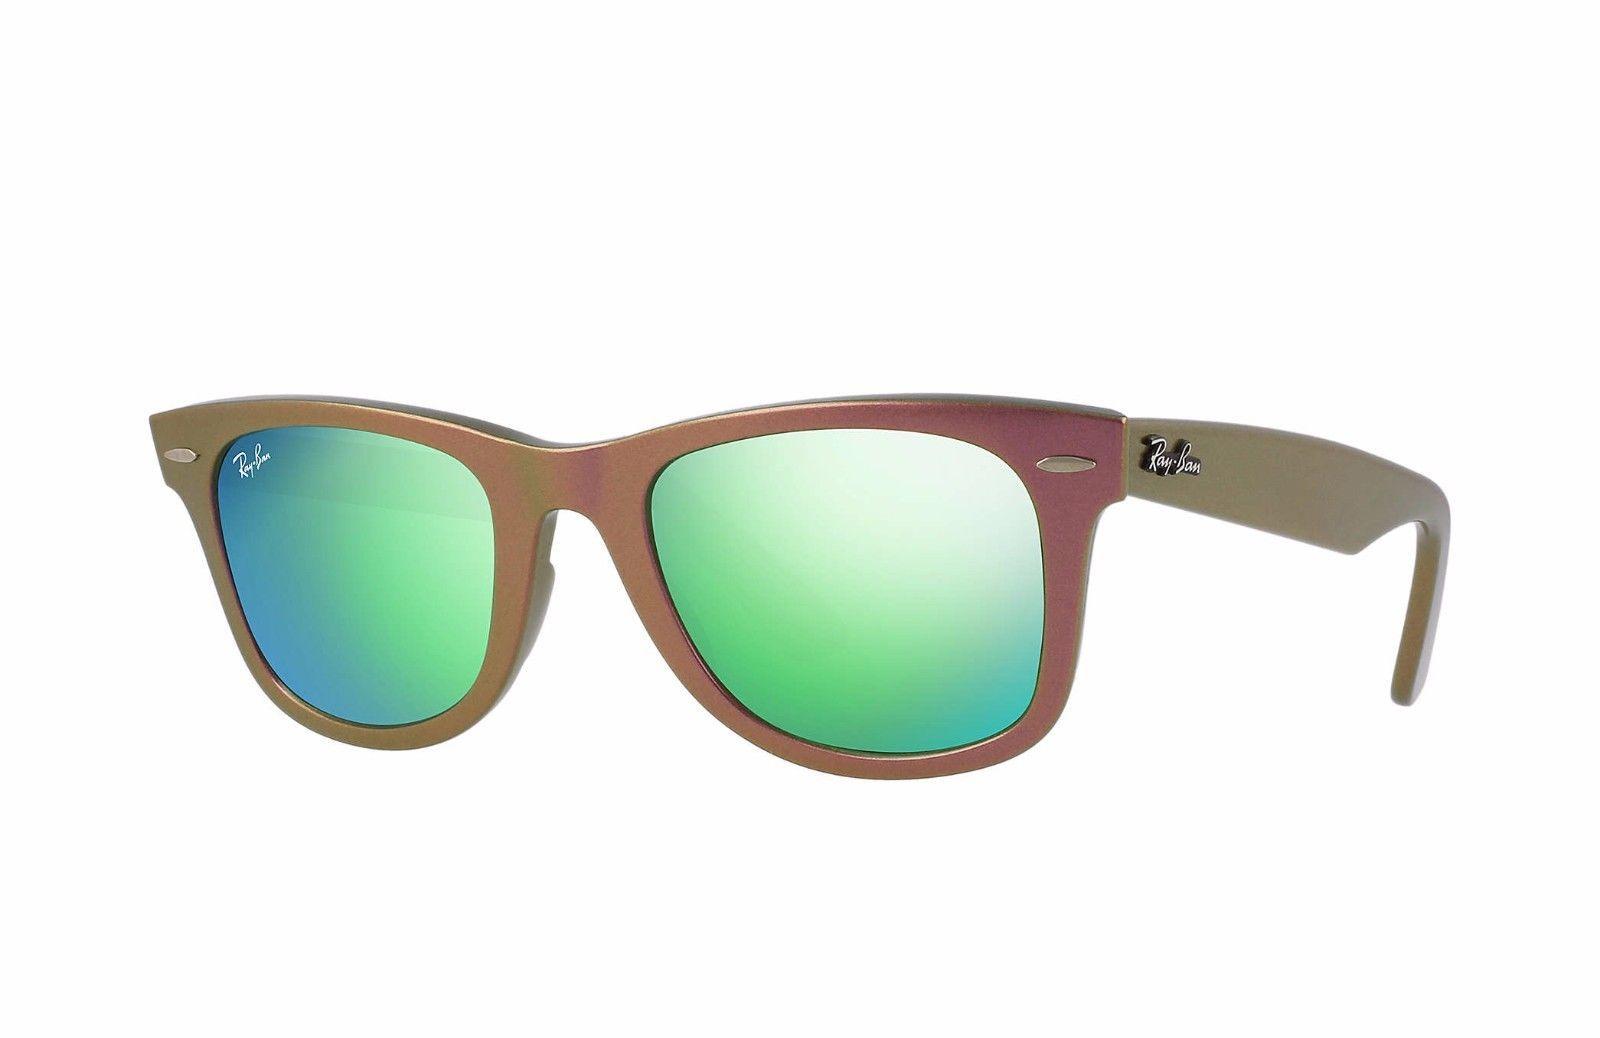 8115dbf404 Ray-Ban RB2140-611019-50 Original Wayfarer Cosmo Green Flash Lens  Sunglasses